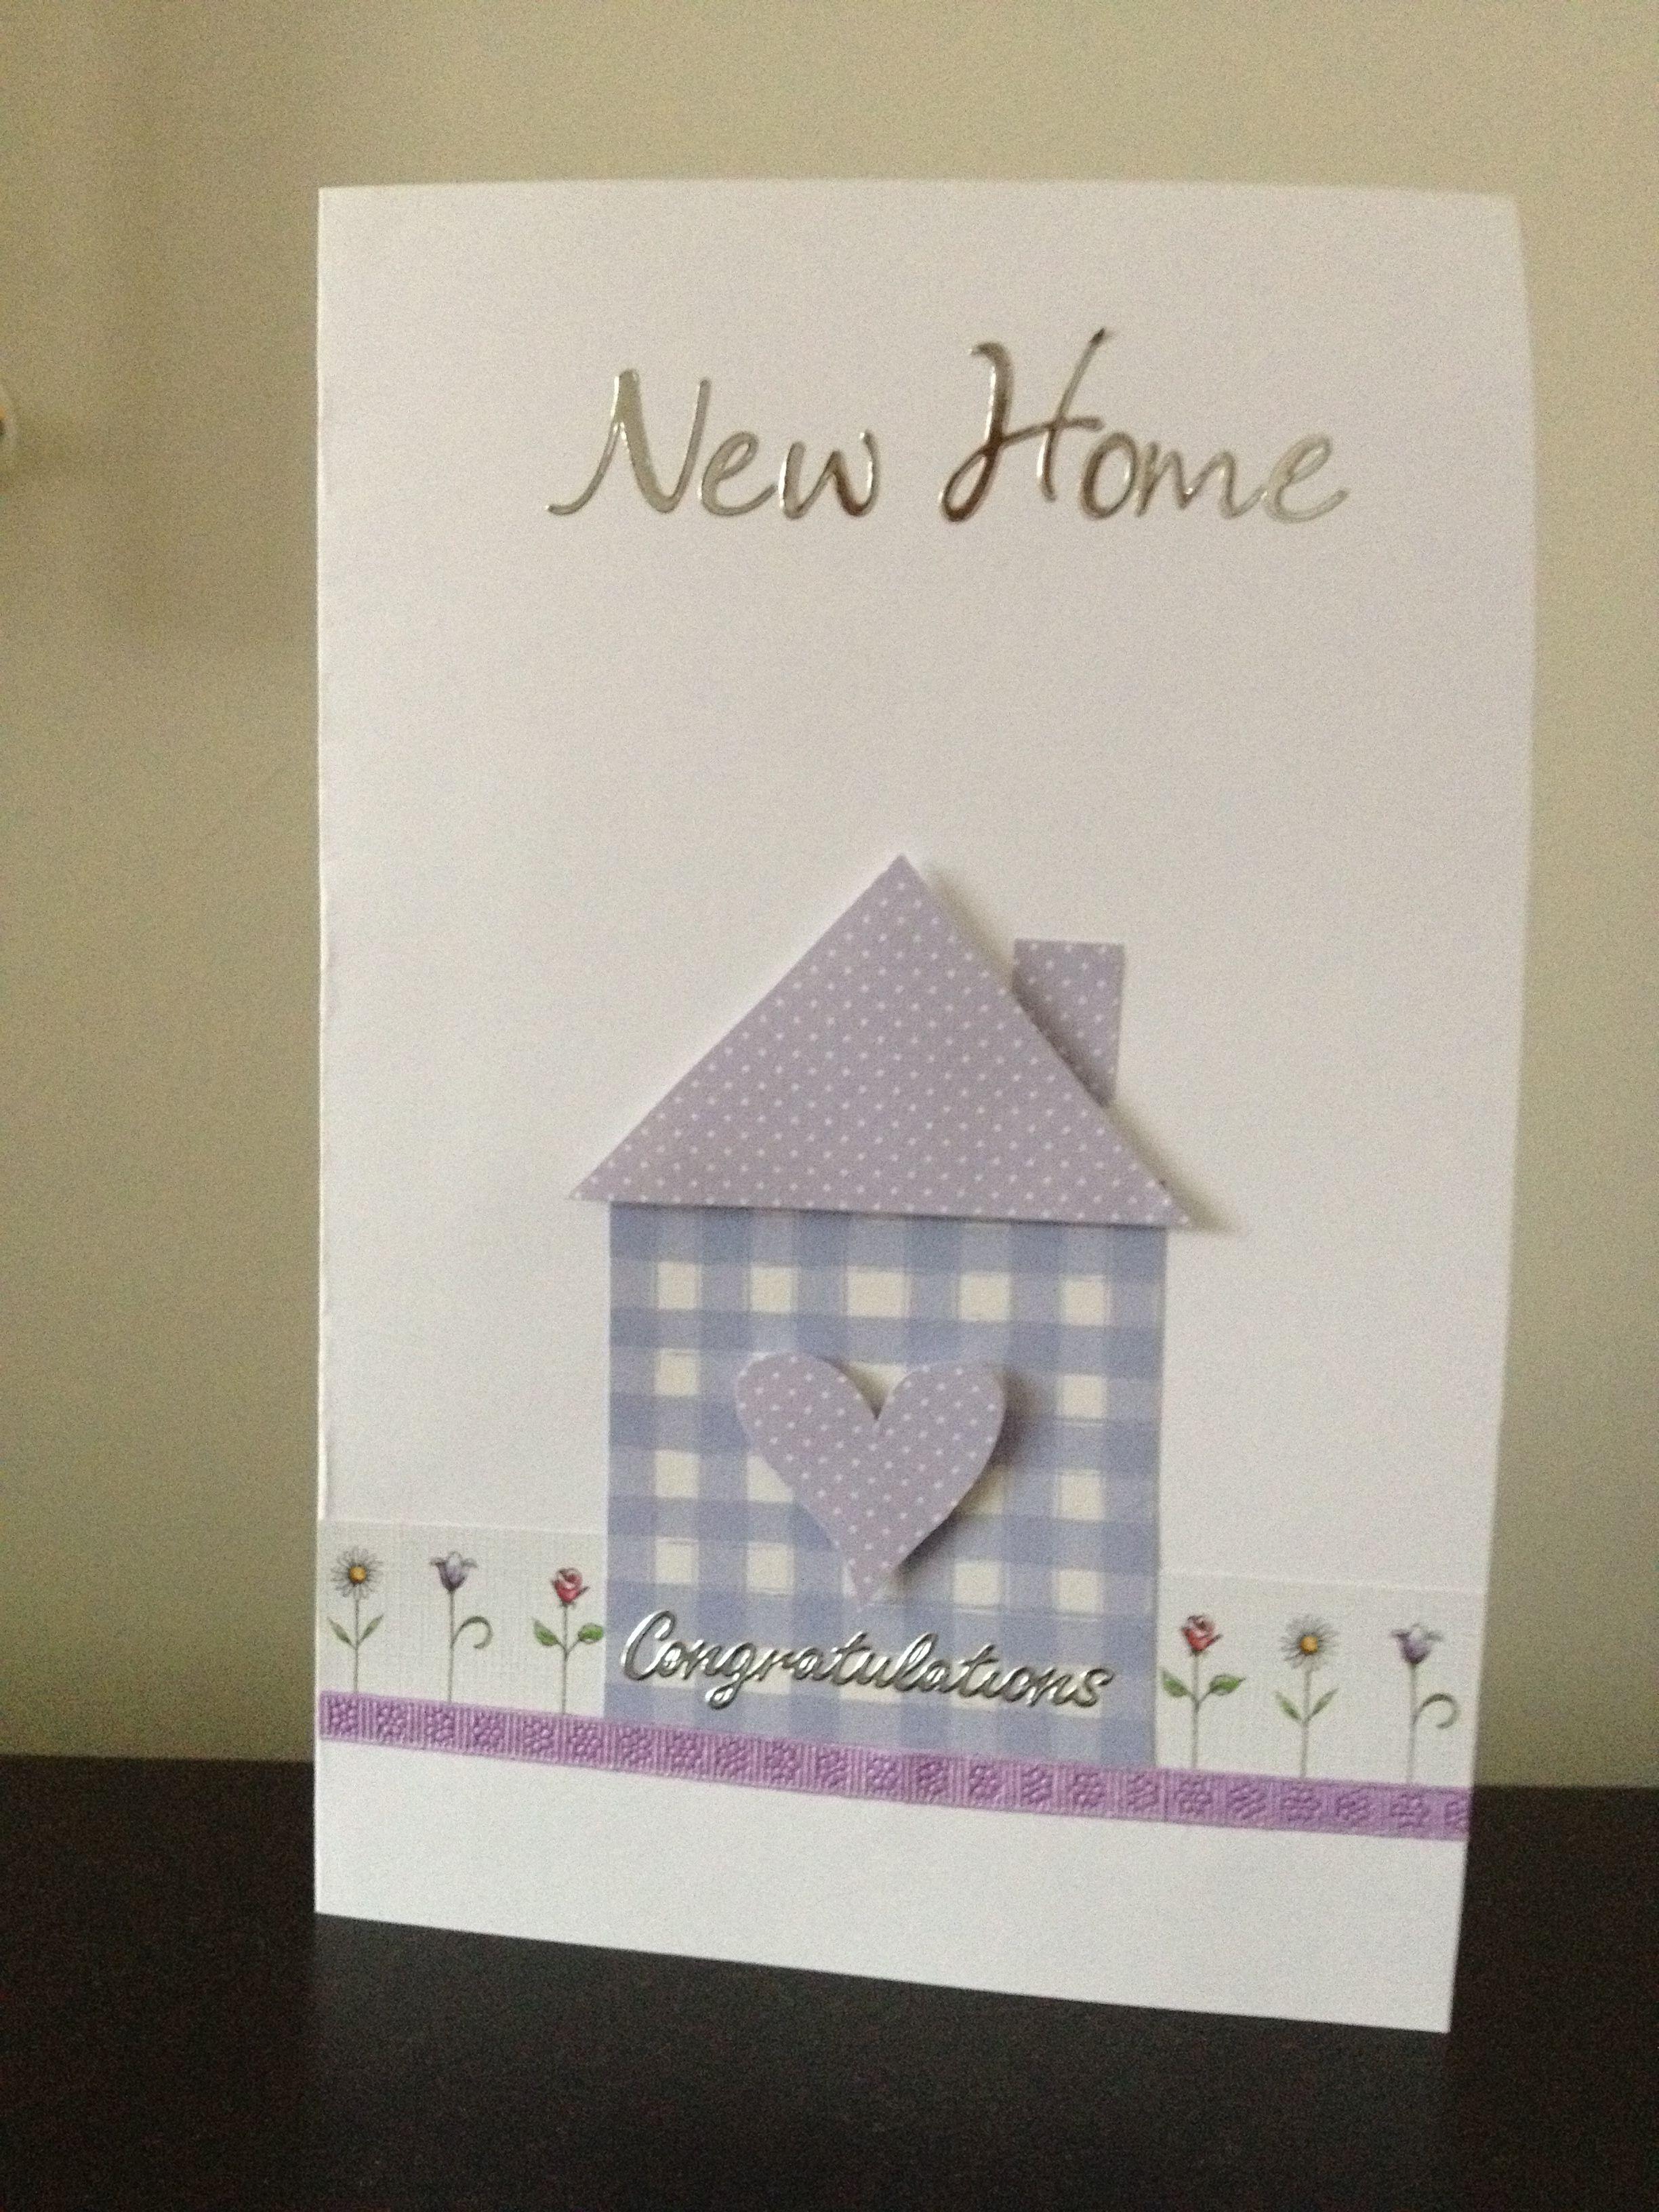 New Home Card Welcome Home Cards New Home Cards Housewarming Card